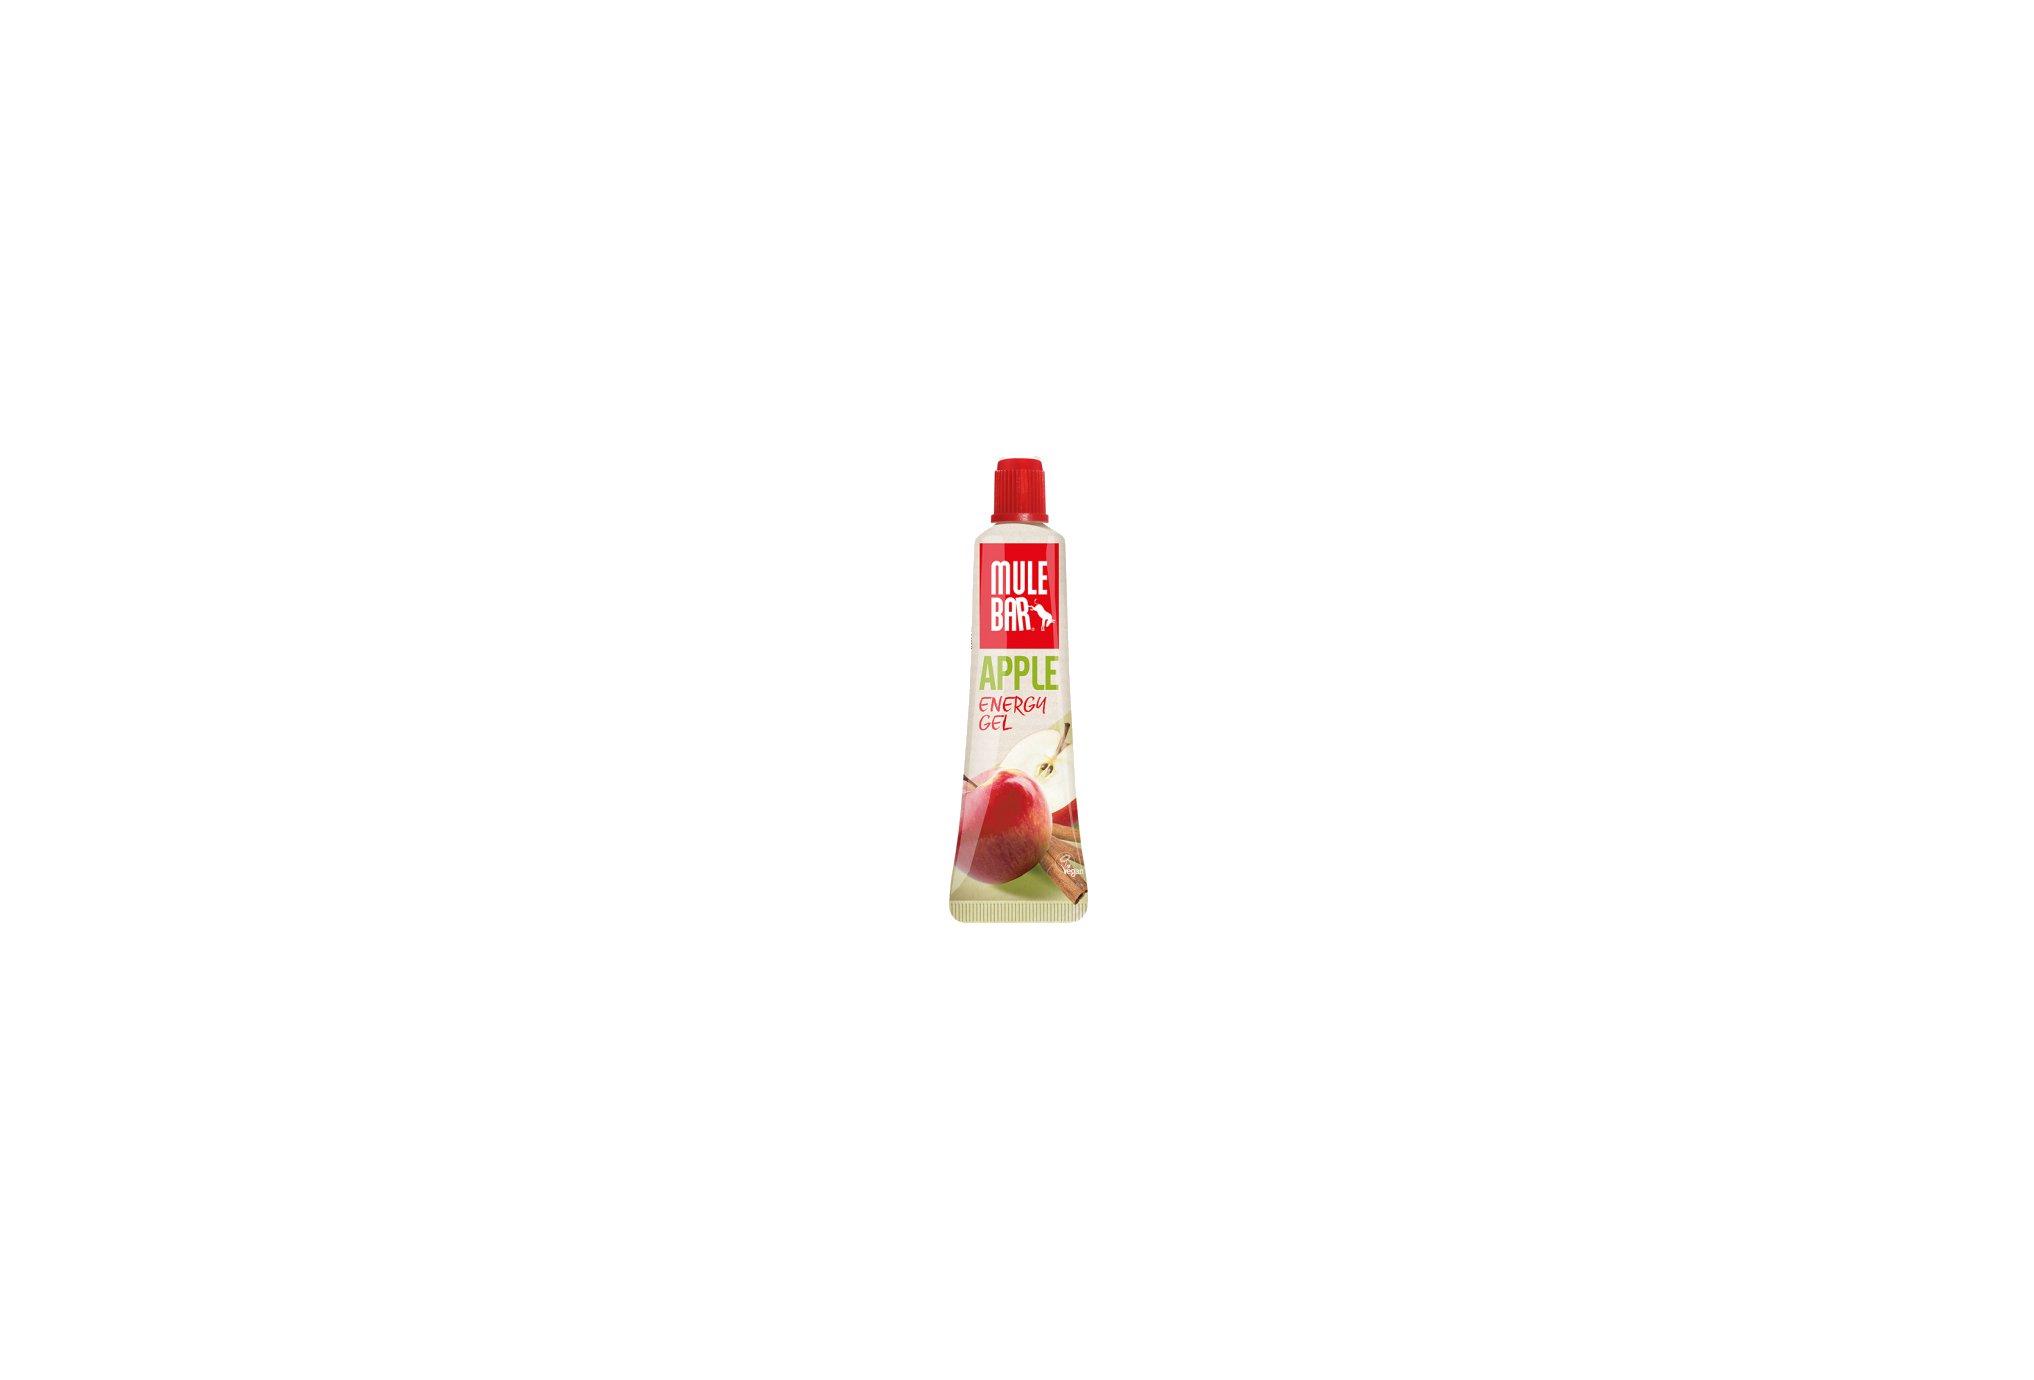 Mulebar Gel Energy Apple Strudel Vegan - Pomme/Cannelle Diététique Gels